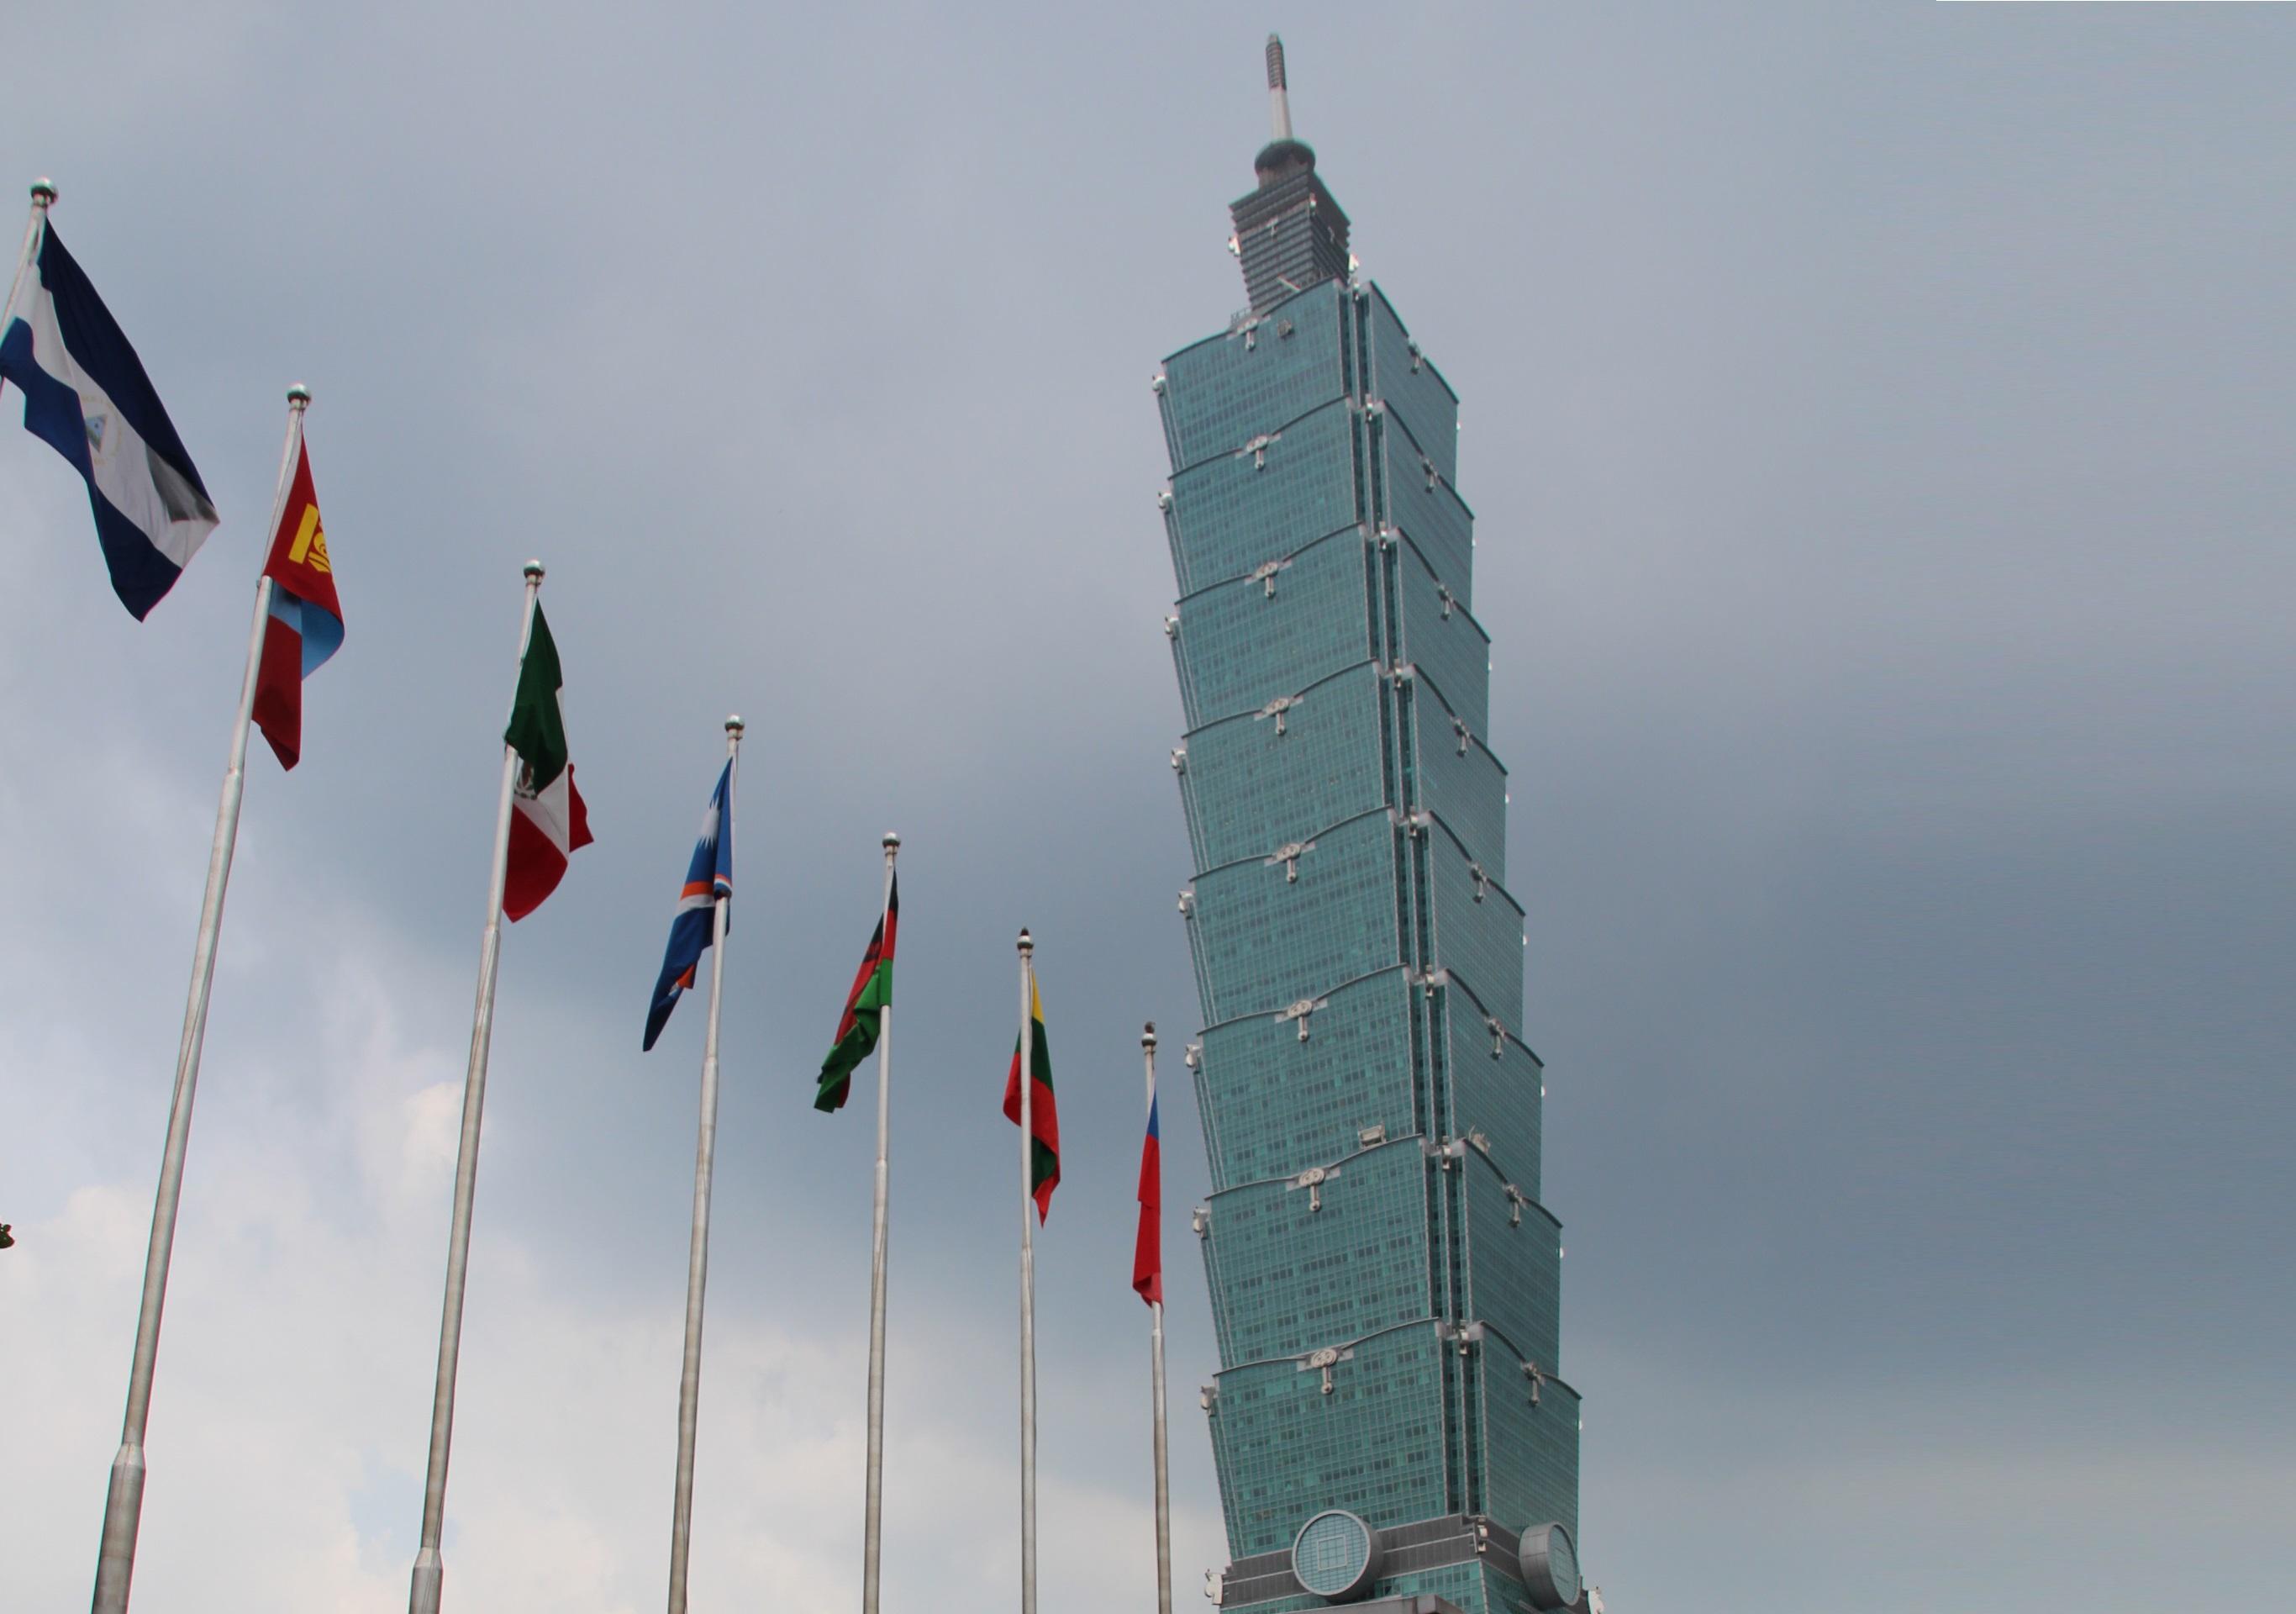 Taipei 101's land value highest in Taiwan's capital